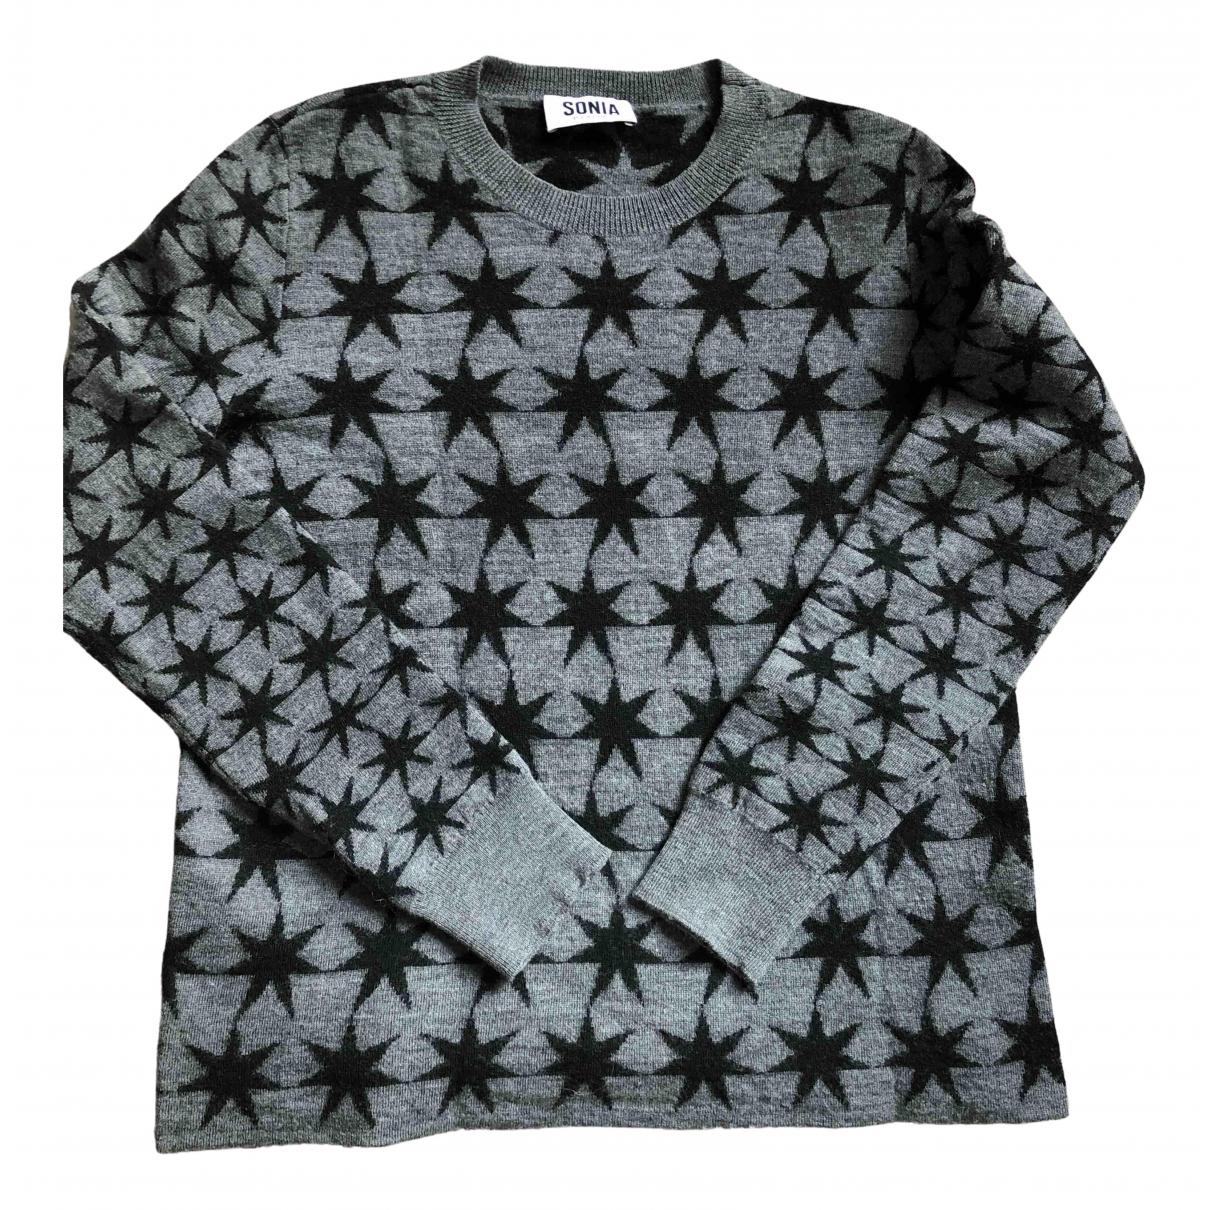 Sonia By Sonia Rykiel N Grey Wool Knitwear for Women S International